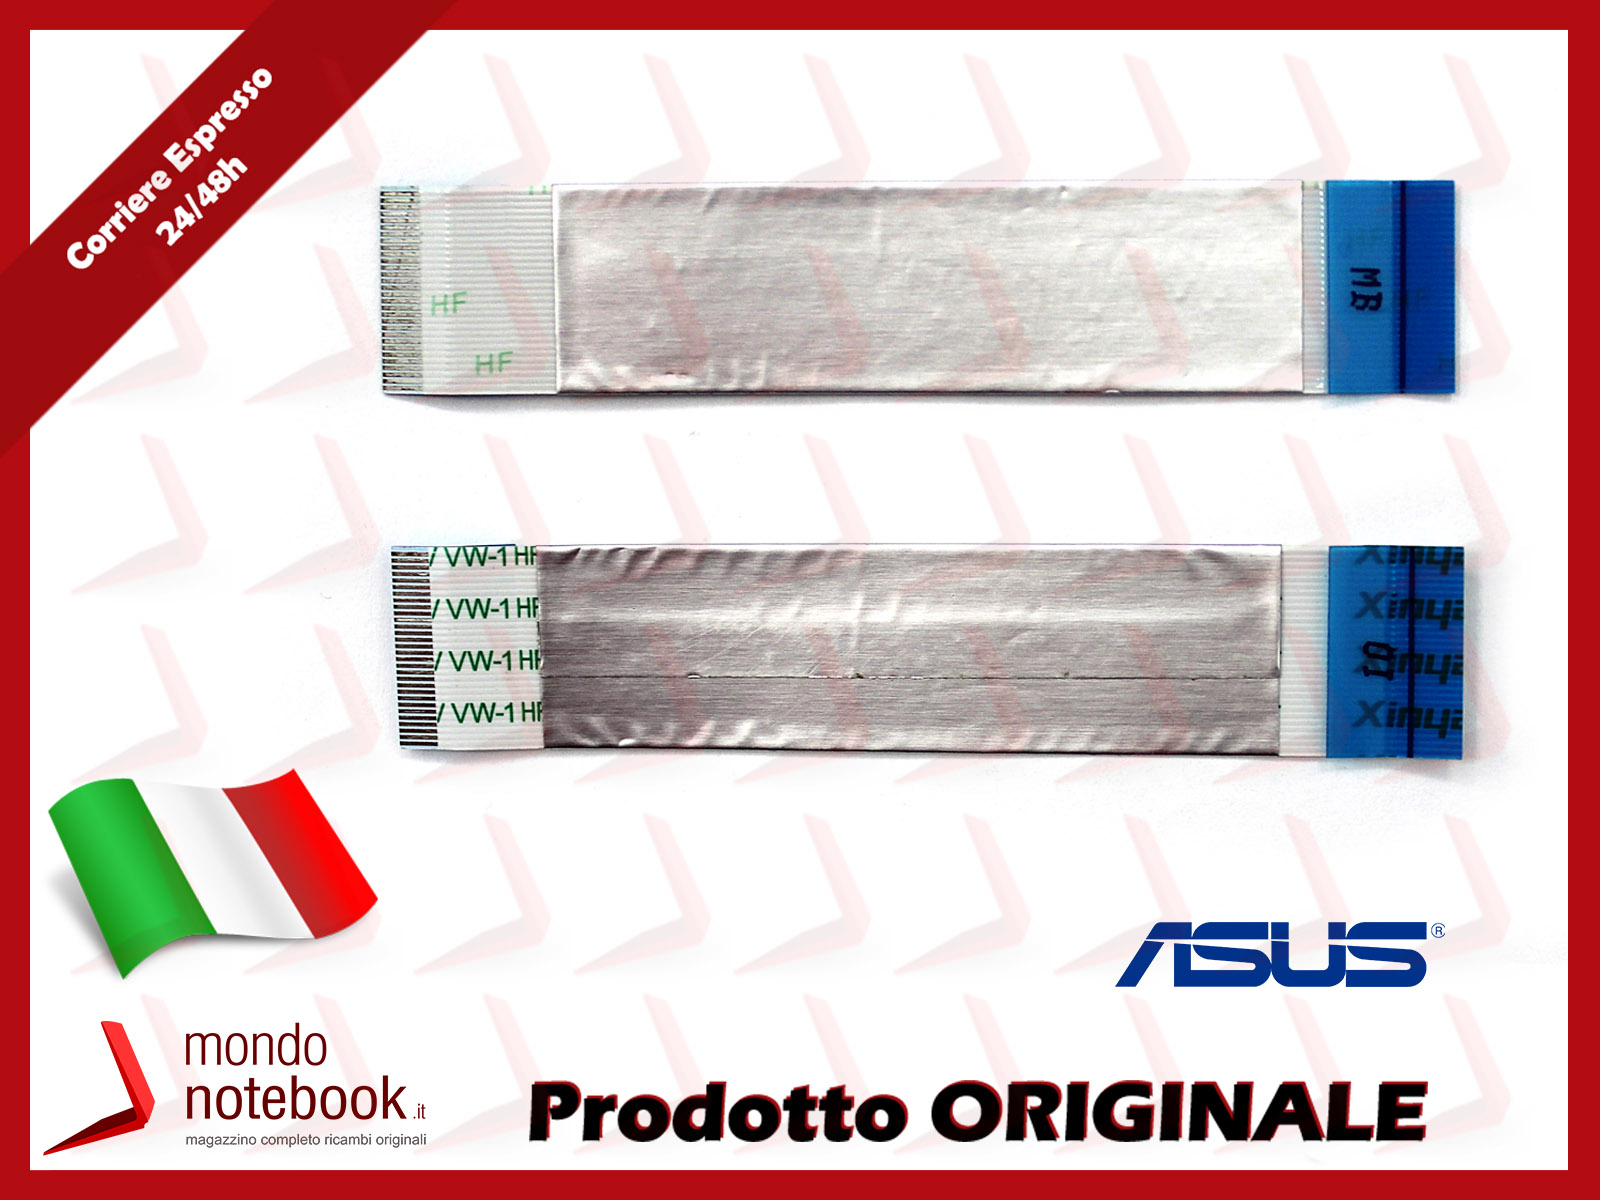 https://www.mondonotebook.it/5677/batteria-rigenerata-originale-hp-dv3-dv3z-cq35-6-celle.jpg